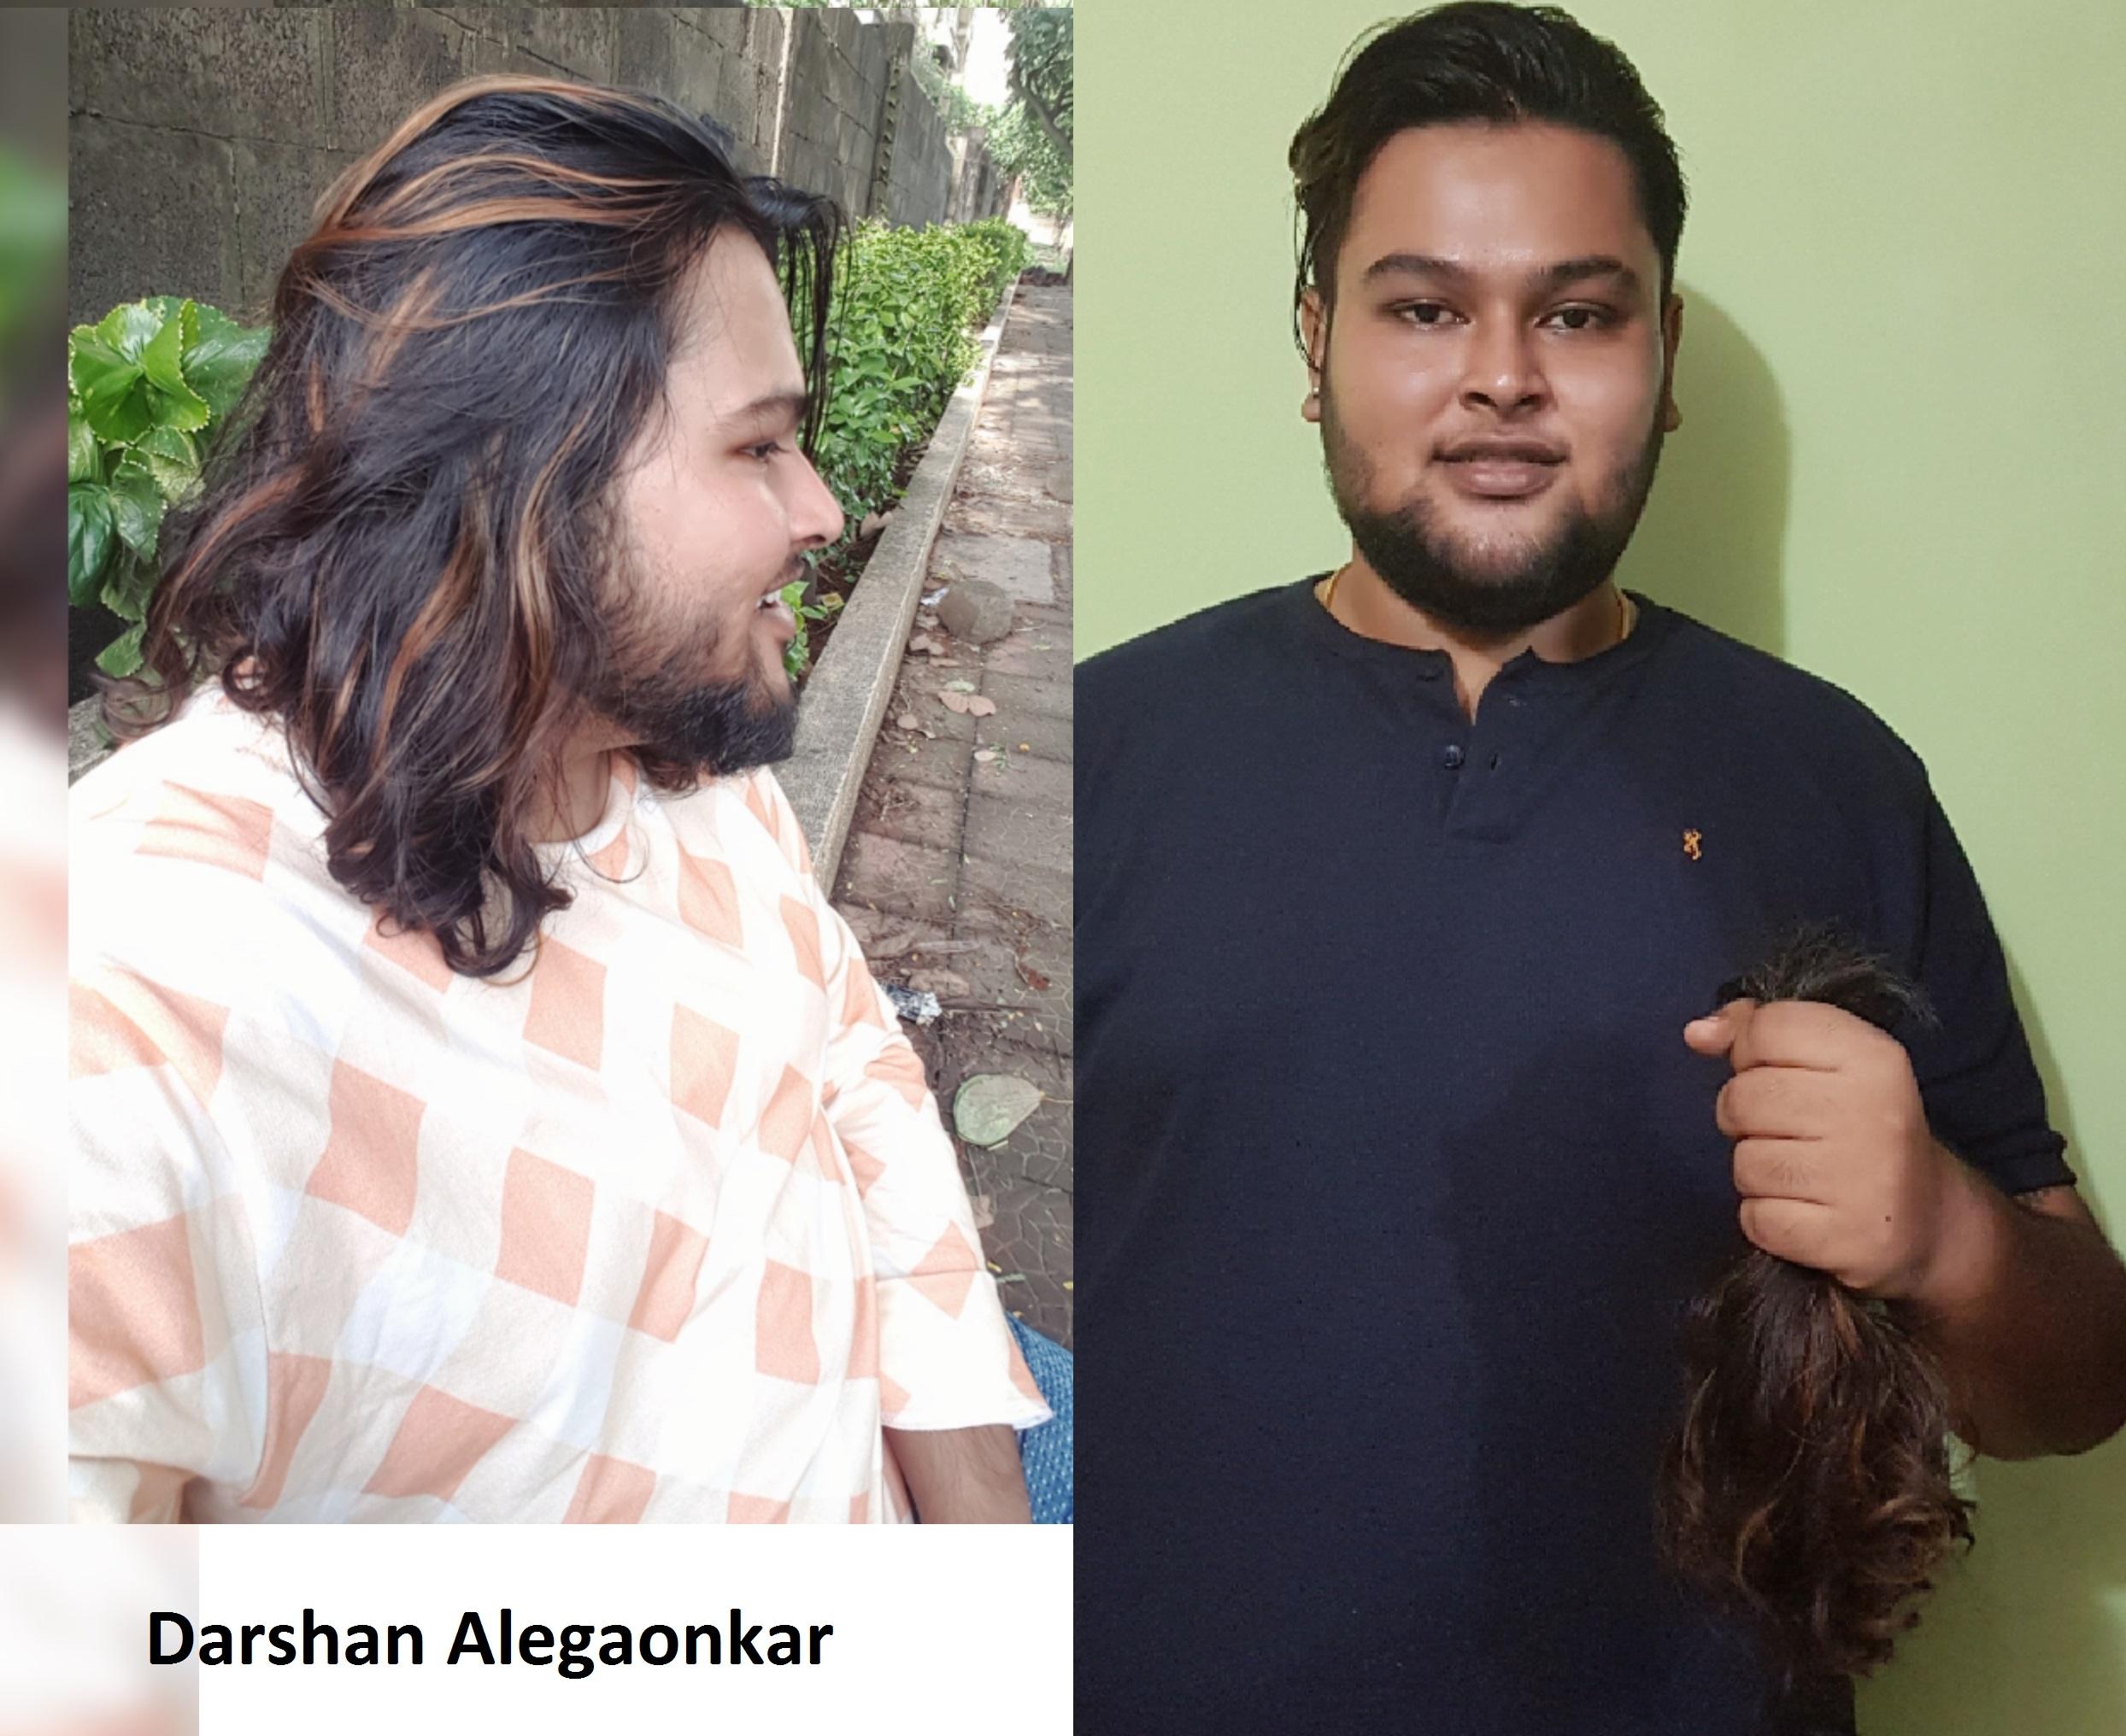 Darshan Alegaonkar